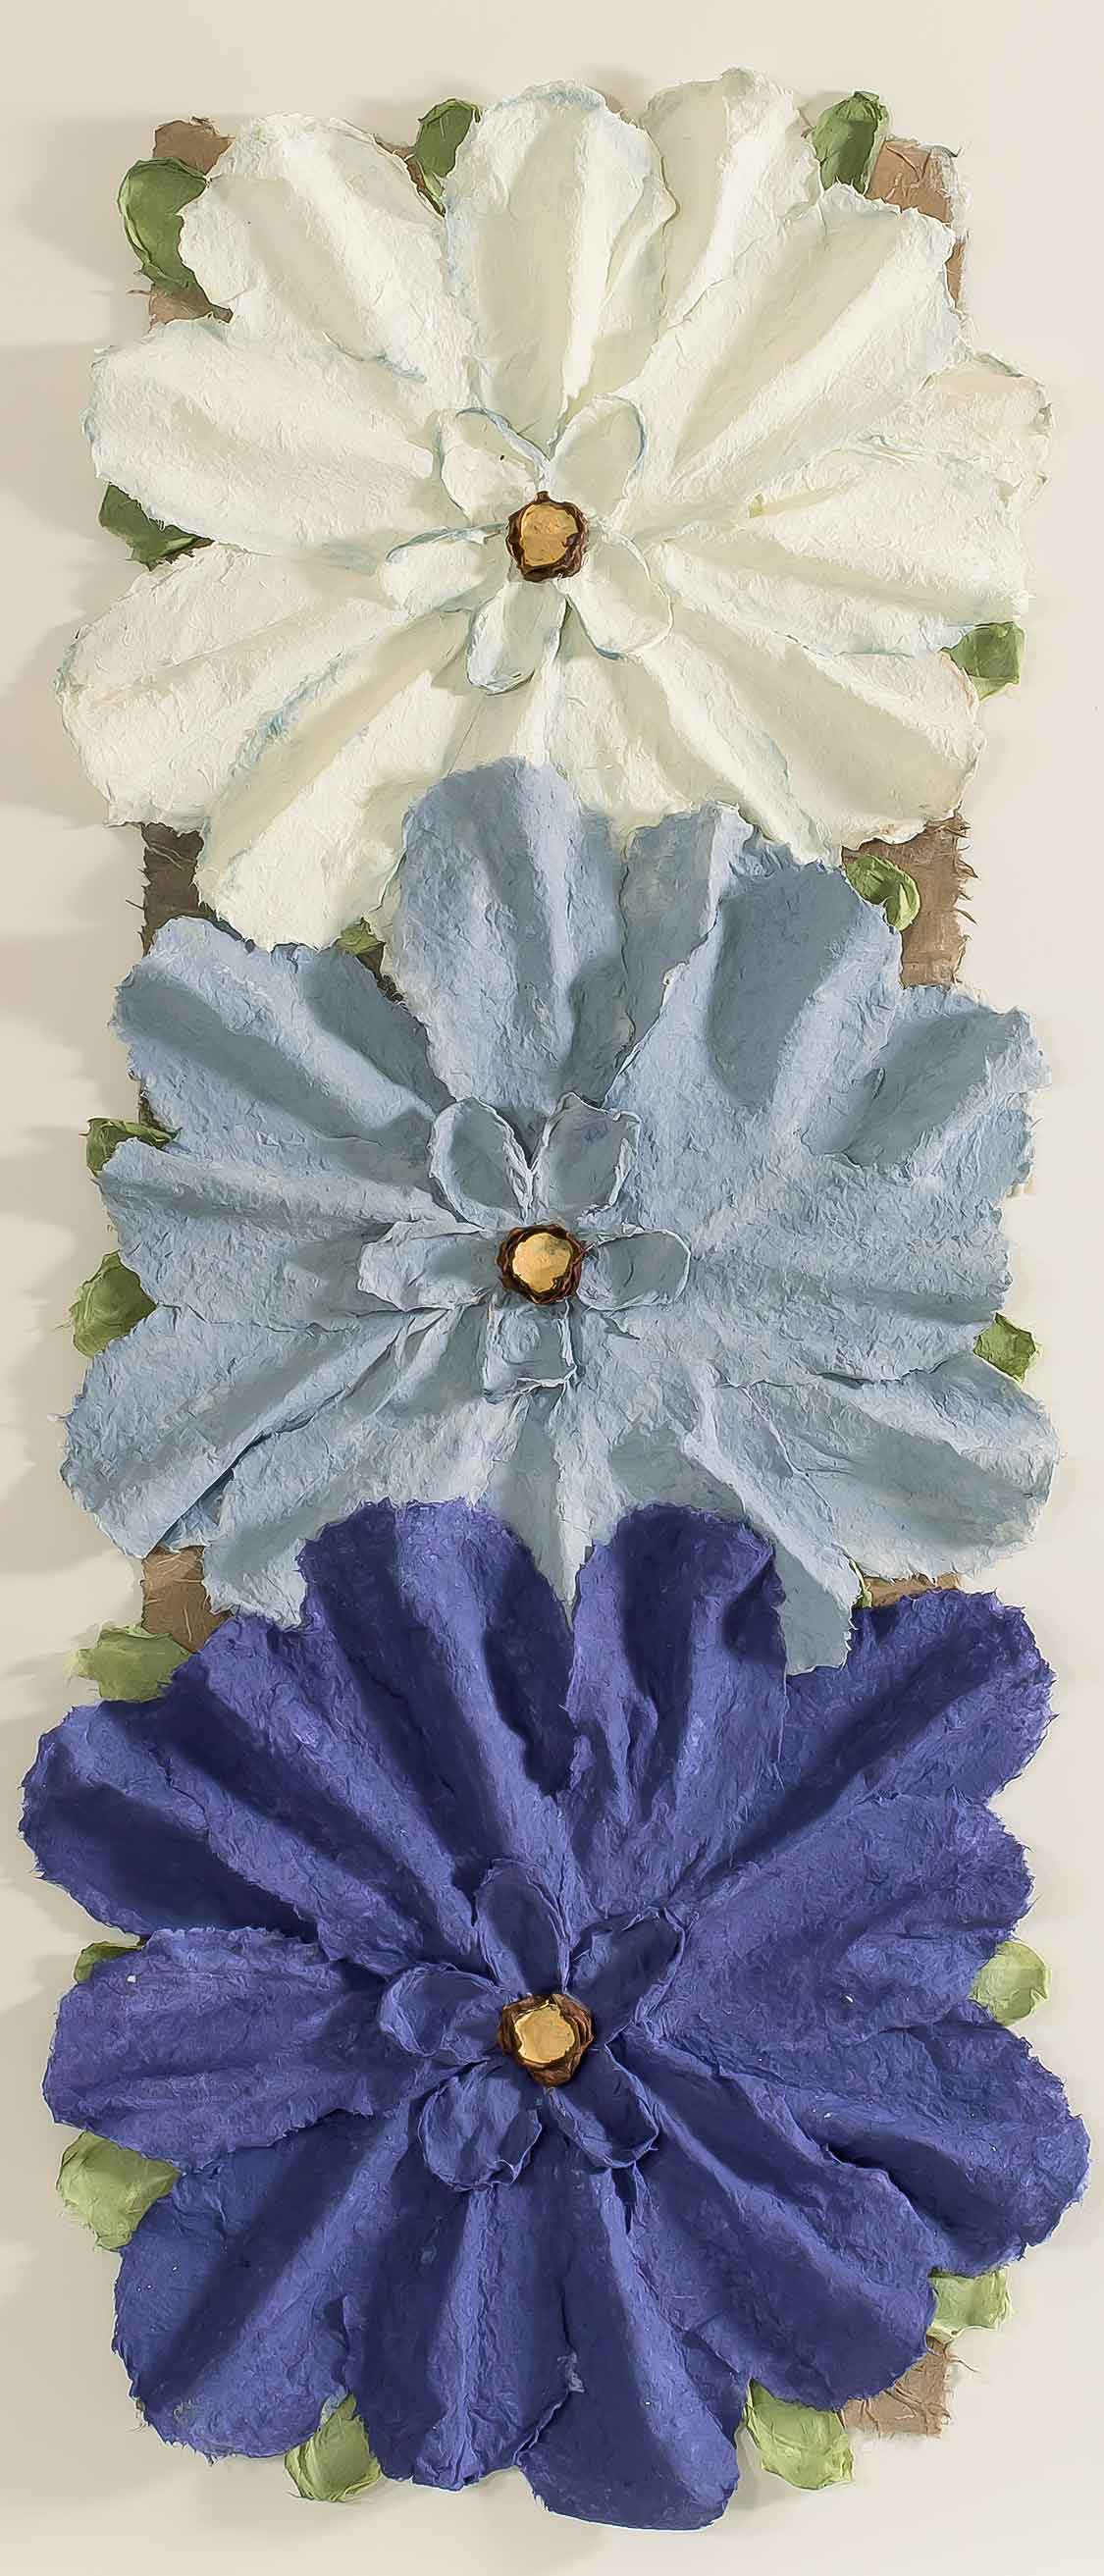 Copy of 3 Piece Blue Flowers 16x36